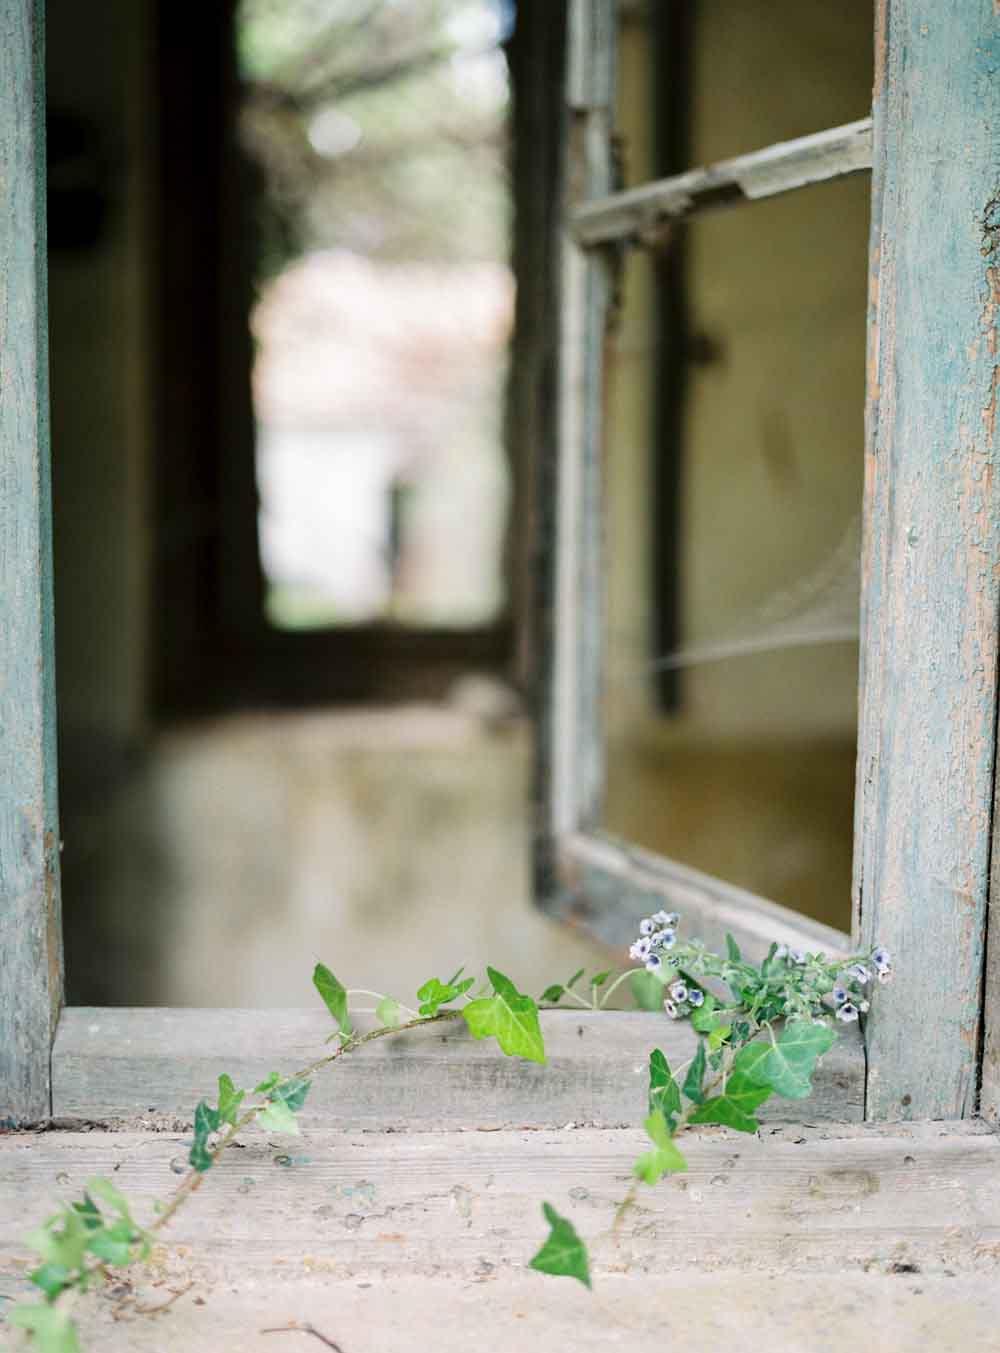 celine_chhuon_photography_tatoi_palace18.jpg